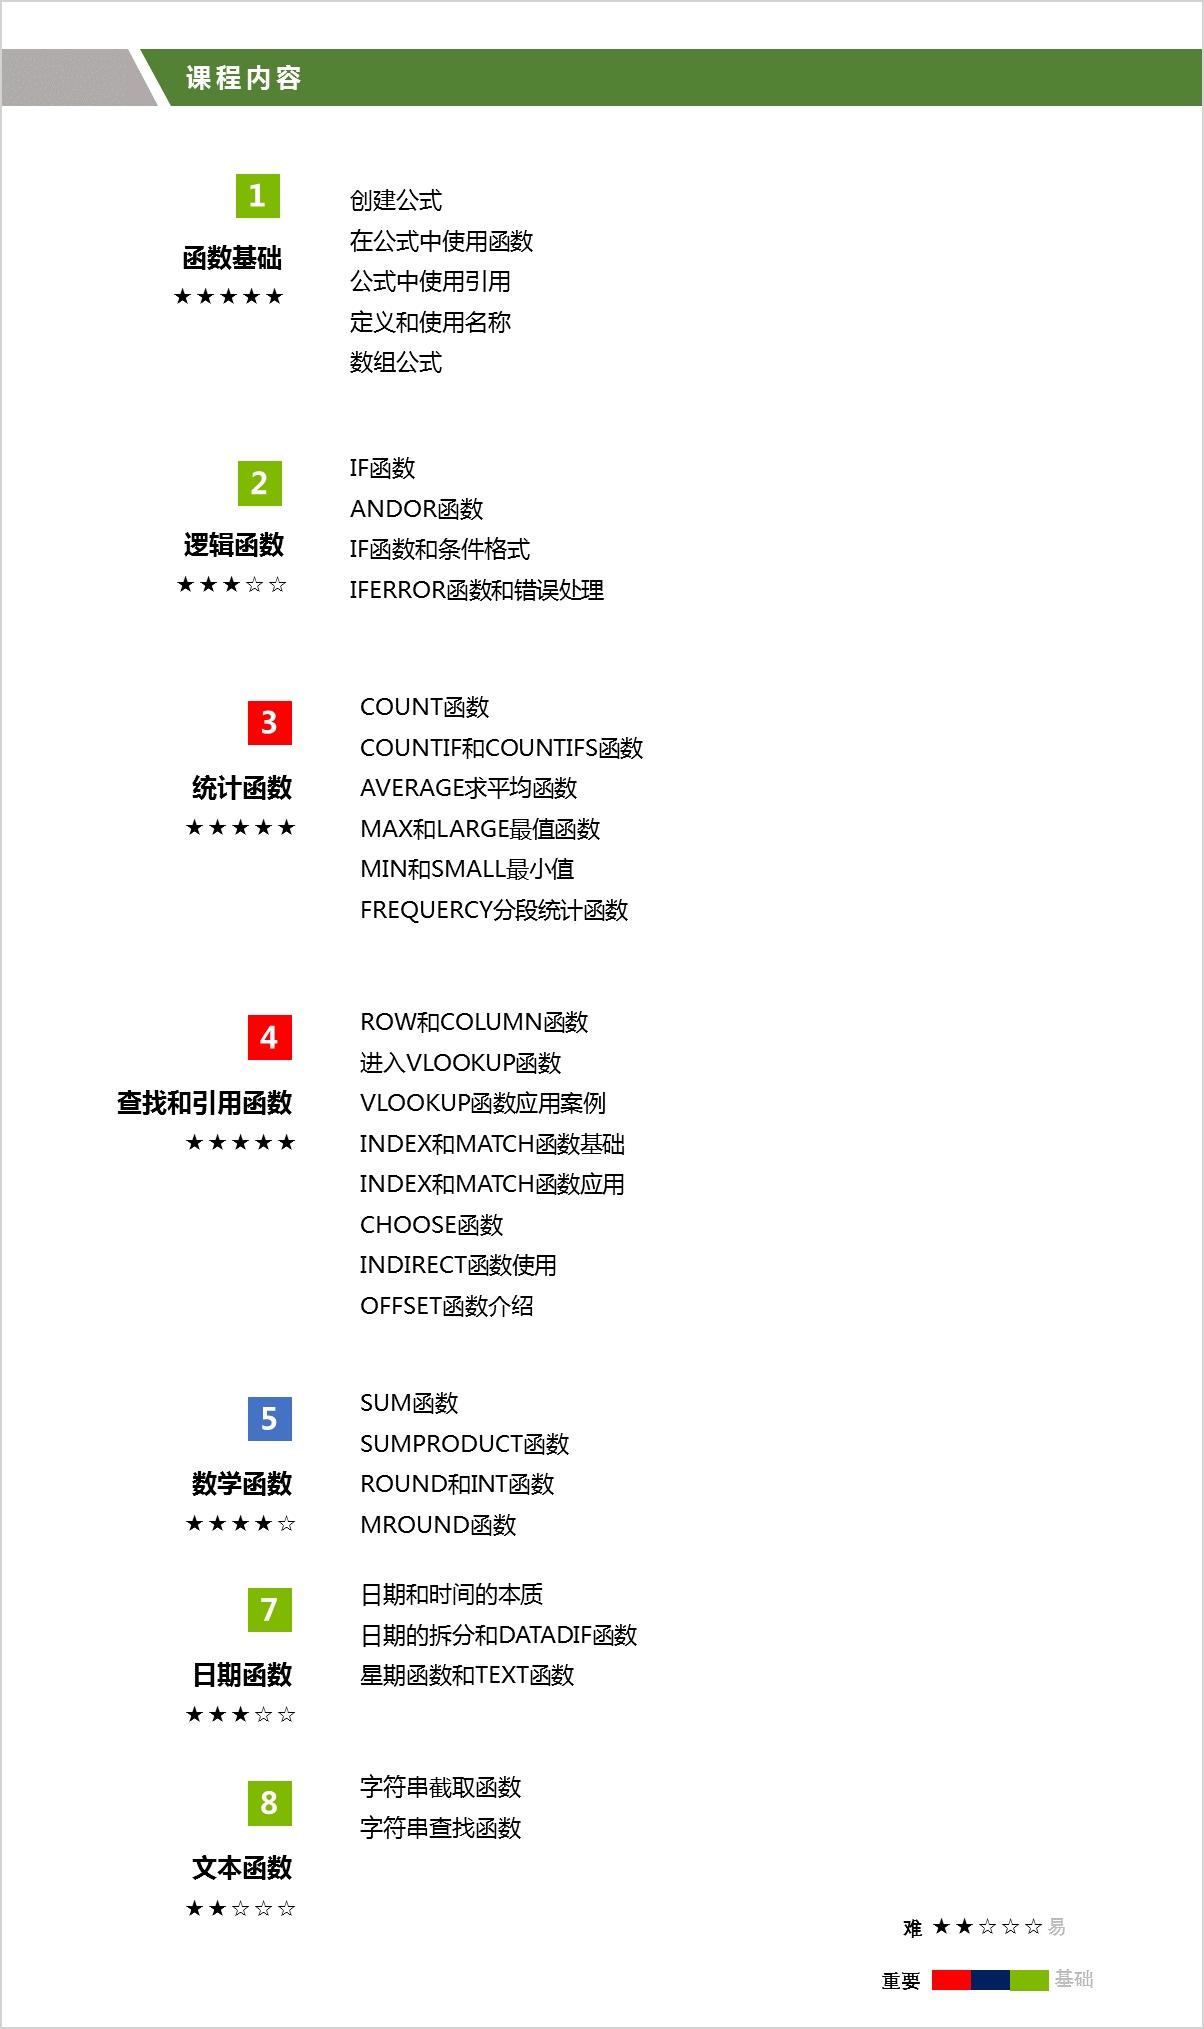 VIP函数文案改进4-6.jpg